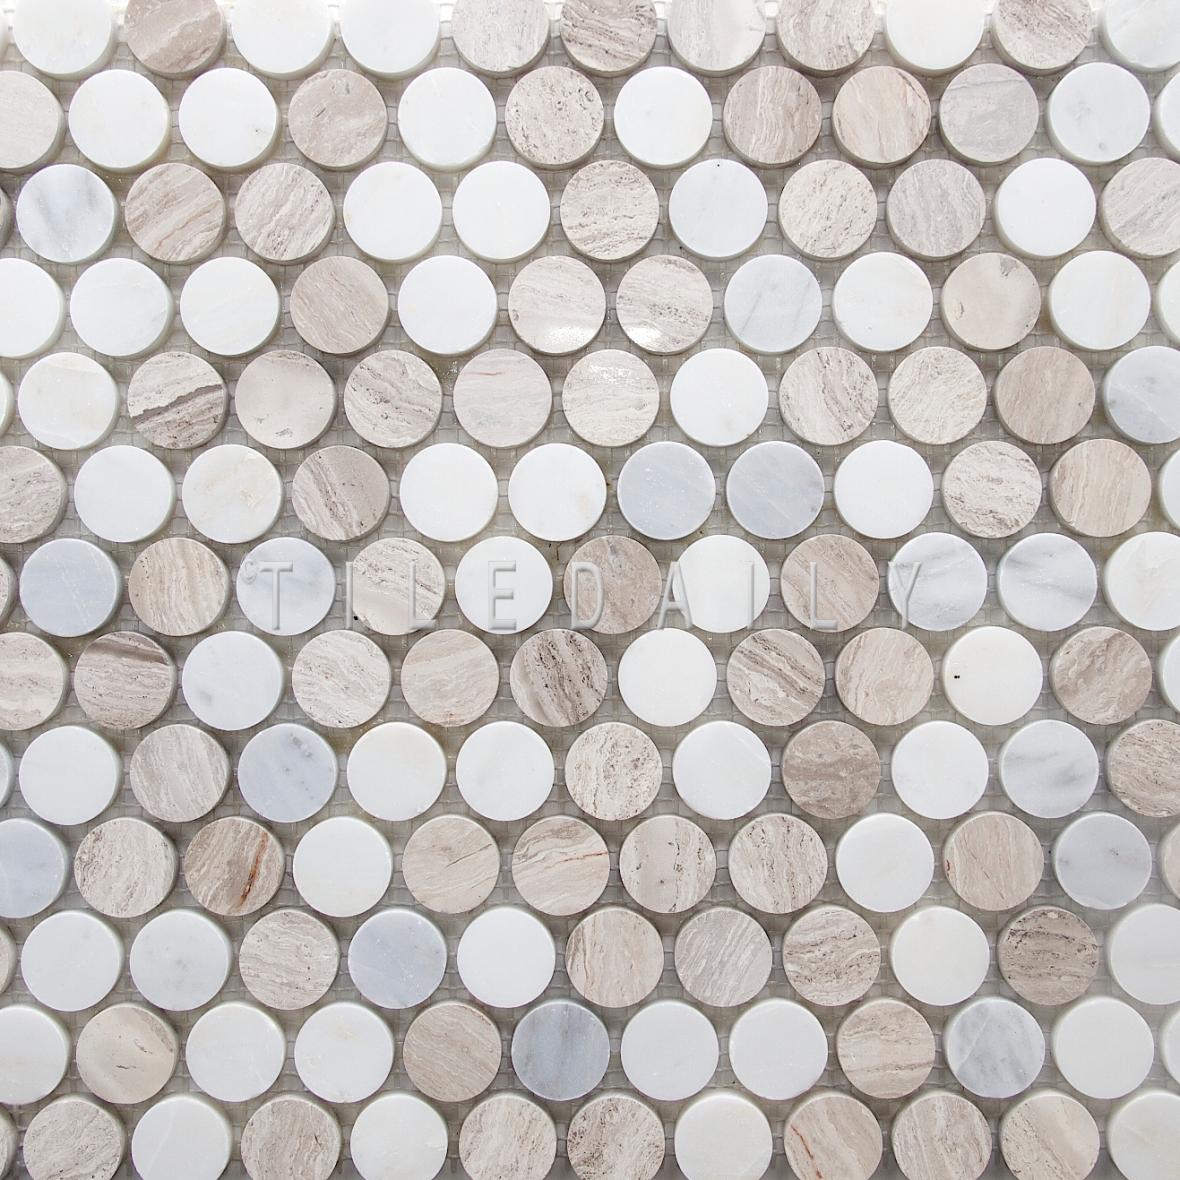 NS0043LBG - Marble Penny Round Mosaic, Mix Cream